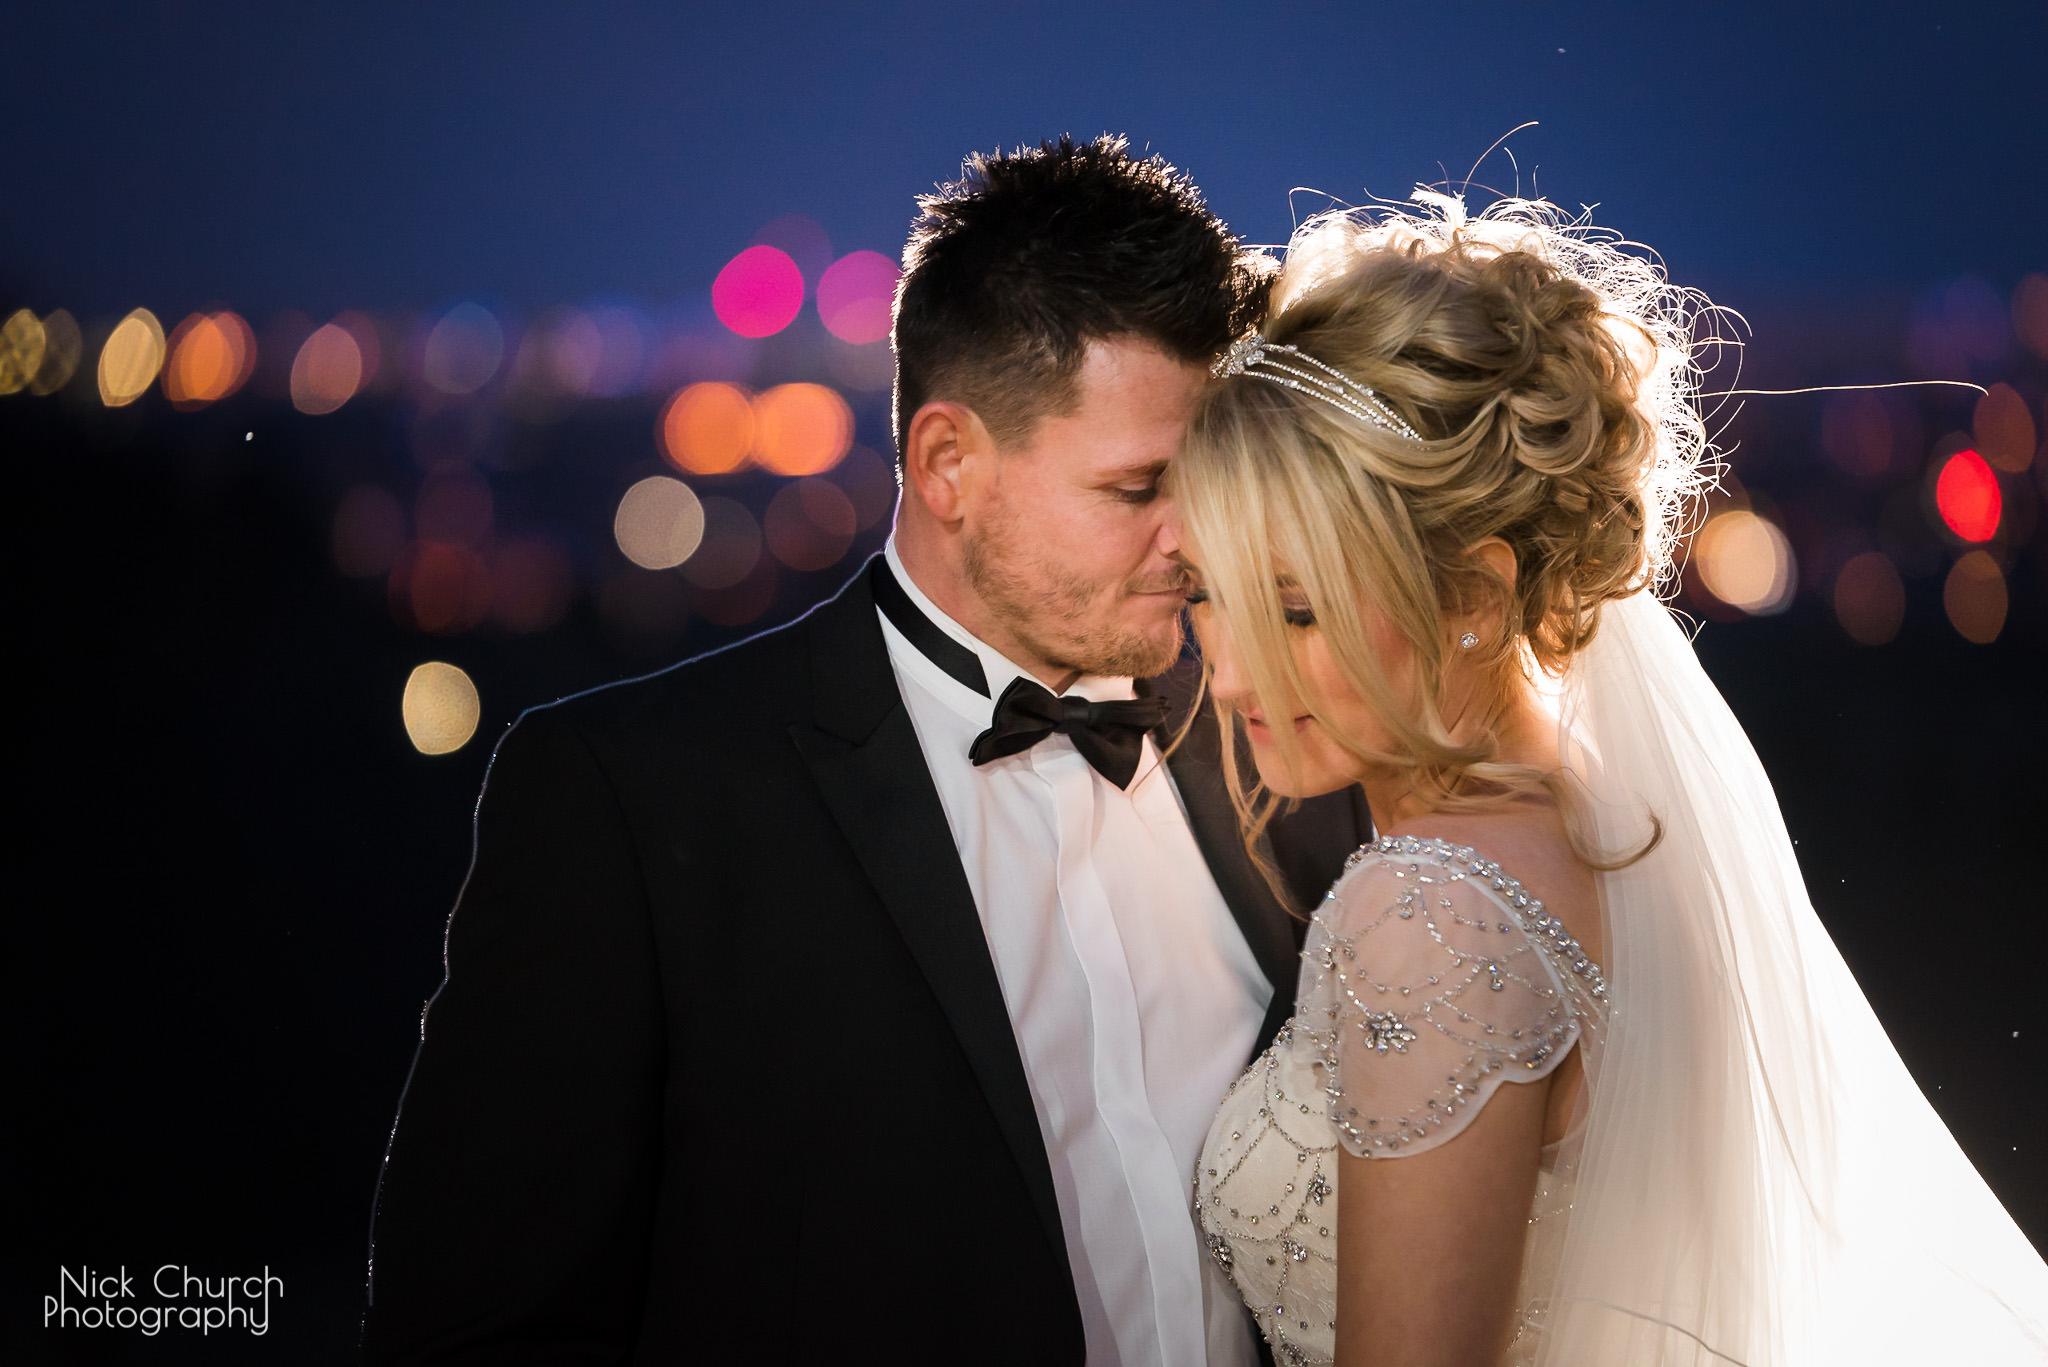 NC-20180317-stacy-and-mike-wedding-2056.jpg